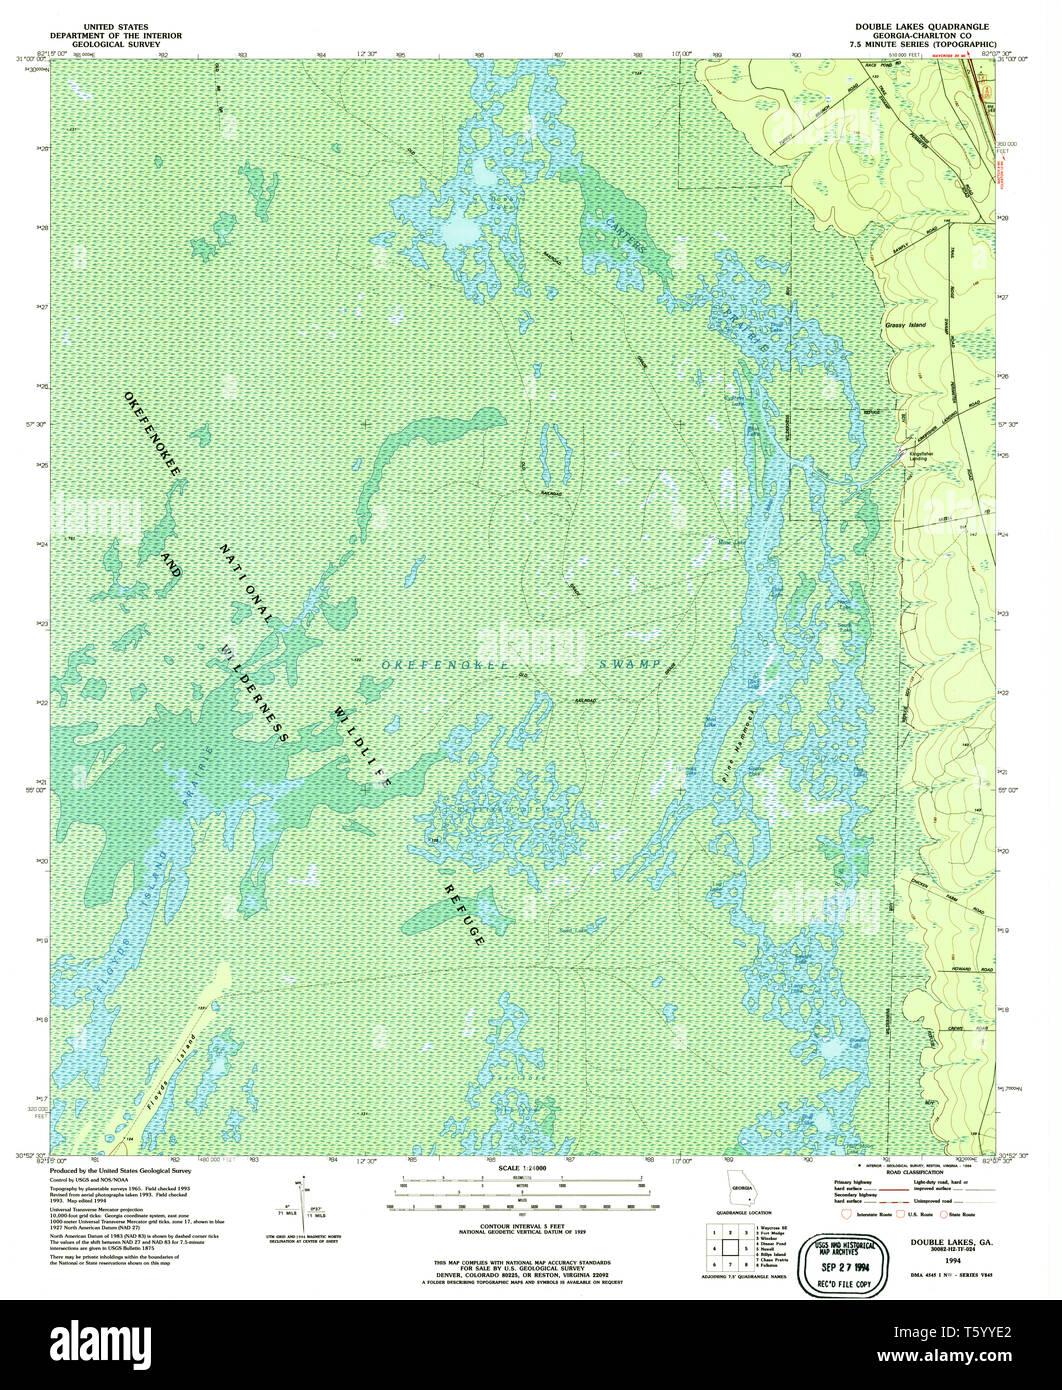 USGS TOPO Map Georgia GA Double Lakes 245568 1994 24000 ... Georgia Lakes Map on georgia rainfall map, georgia climate map, georgia animals map, georgia vegetation map, georgia rain map, georgia historical sites map, bartlett lake az fishing map, lake park ga map, georgia farmland map, georgia land map, georgia river map, georgia map with cities, cobb county ga zip code map, georgia backroads map, georgia counties map, georgia marshes map, georgia settlements map, georgia coast map, brasstown bald georgia on map, georgia mountains map,